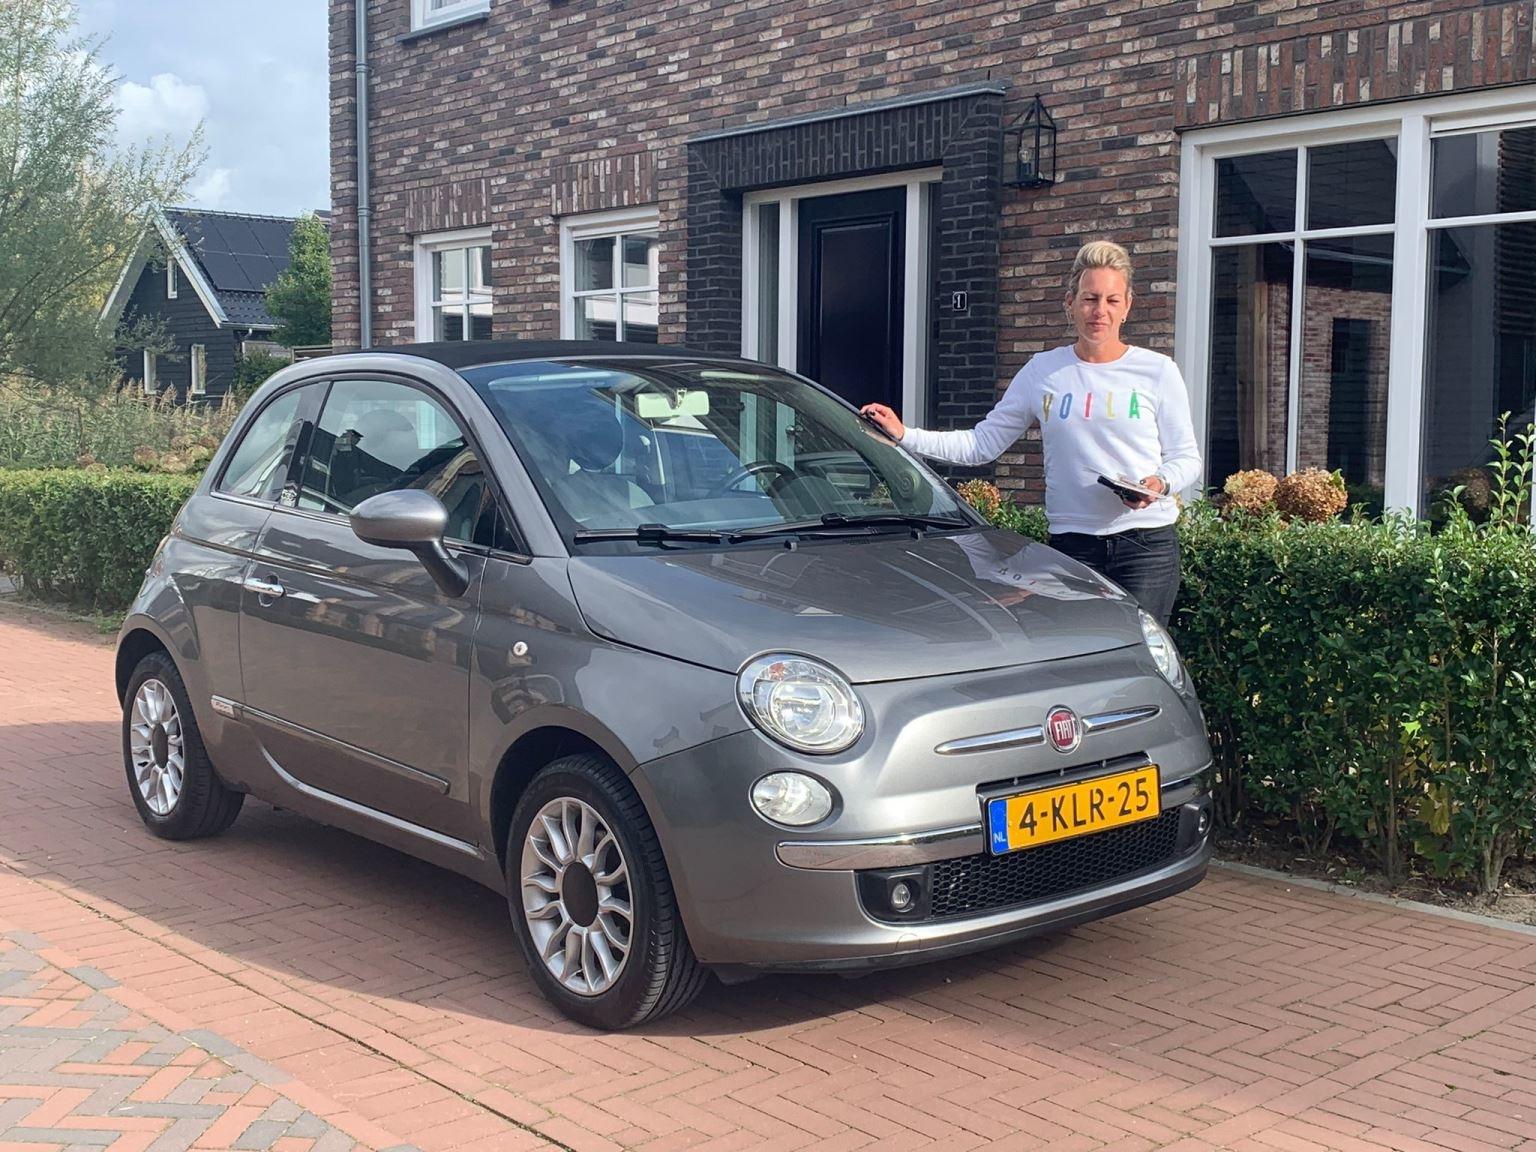 Aflevering Fiat 500C-2021-10-14 14:42:21